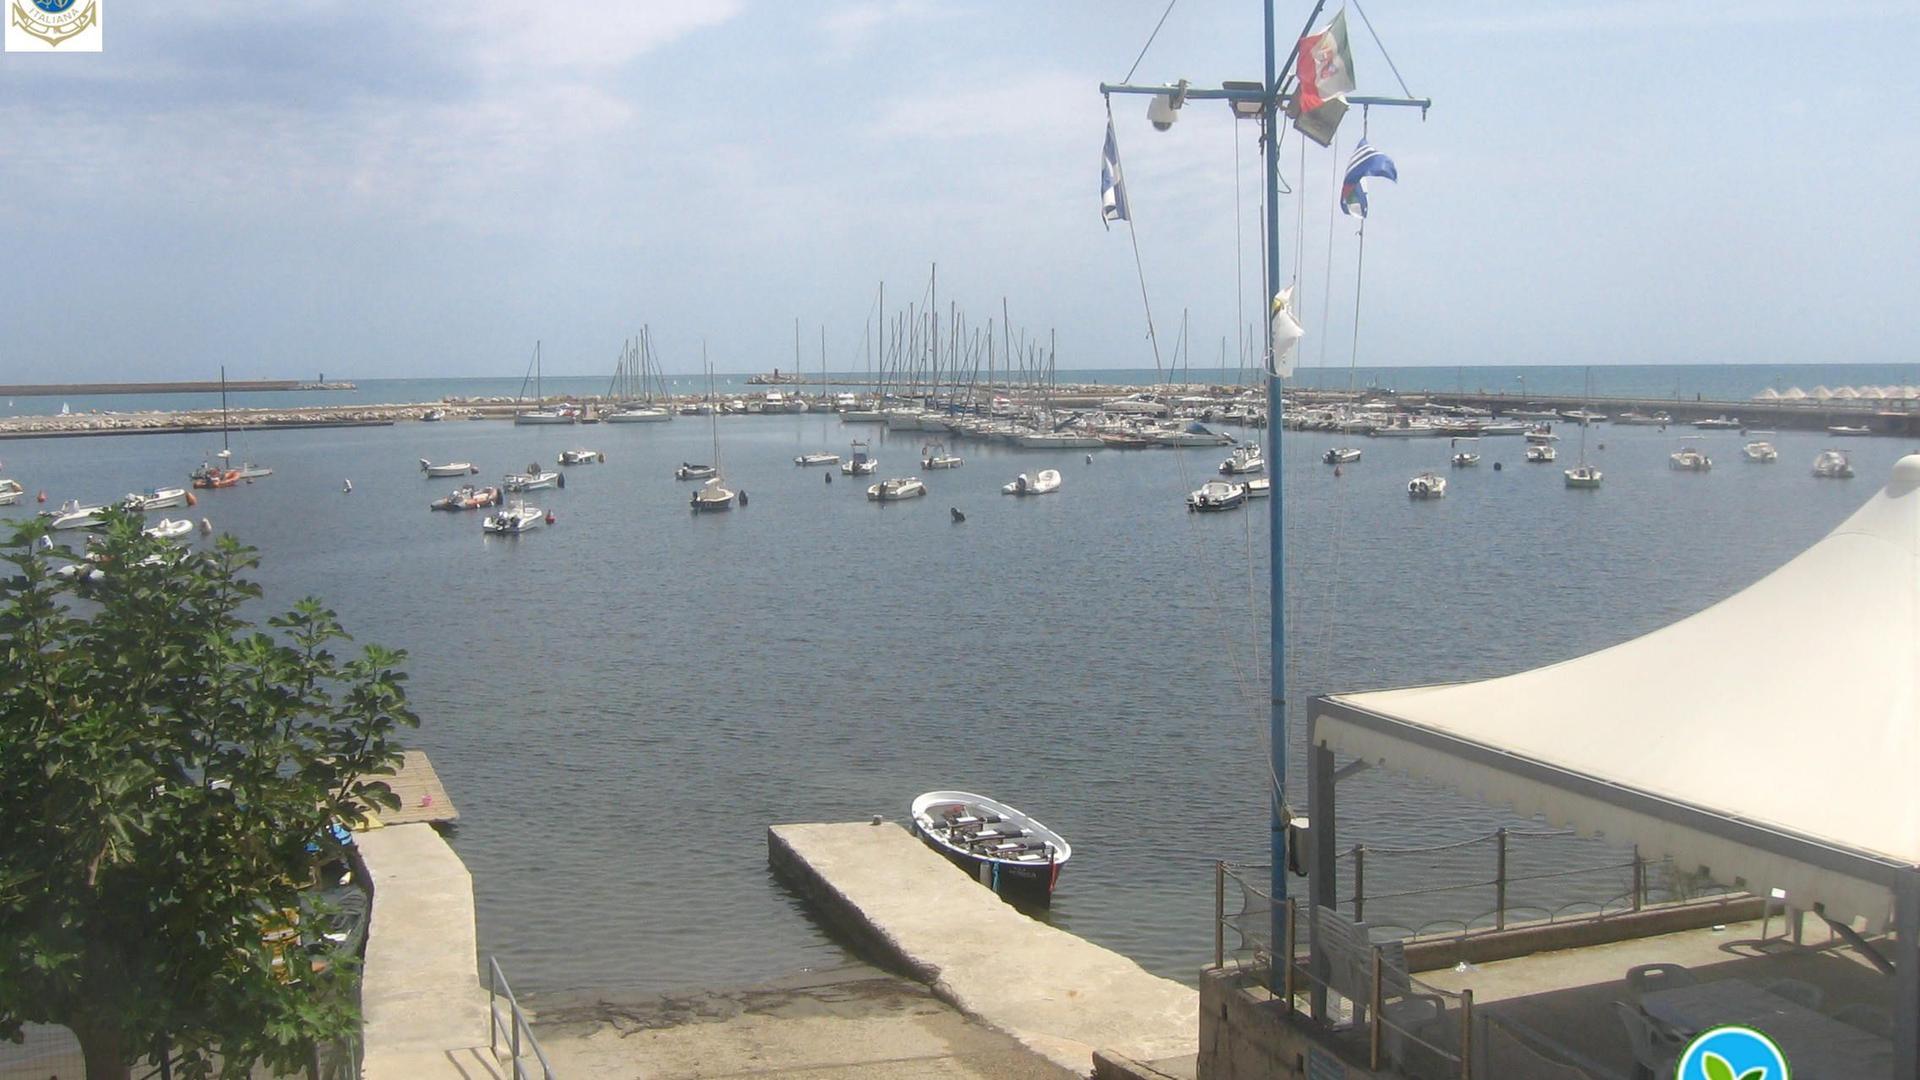 Webkamera Ortona: Lega Navale Italiana sezione